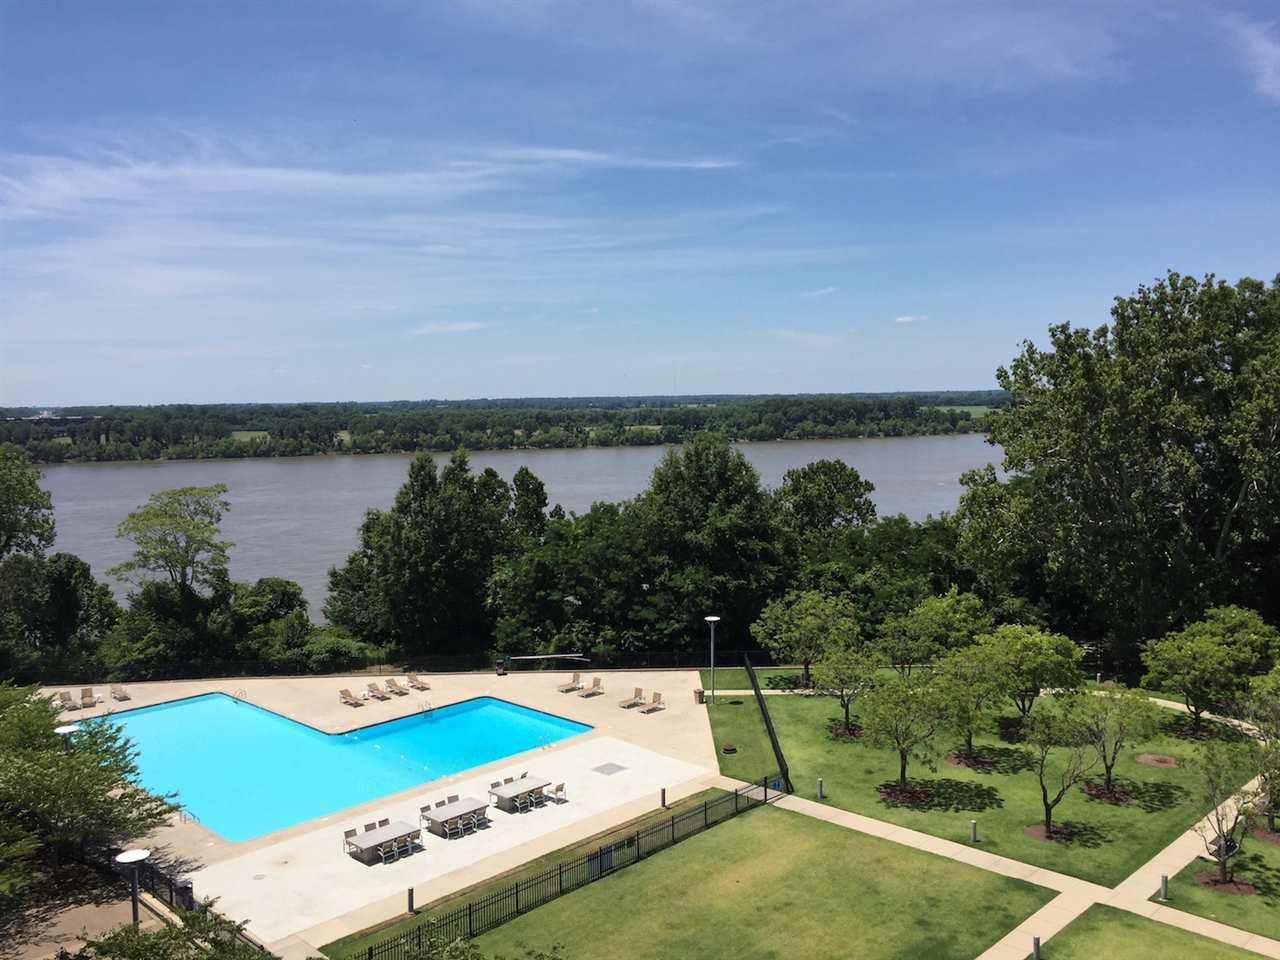 655 RIVERSIDE DR, Memphis, TN 38103